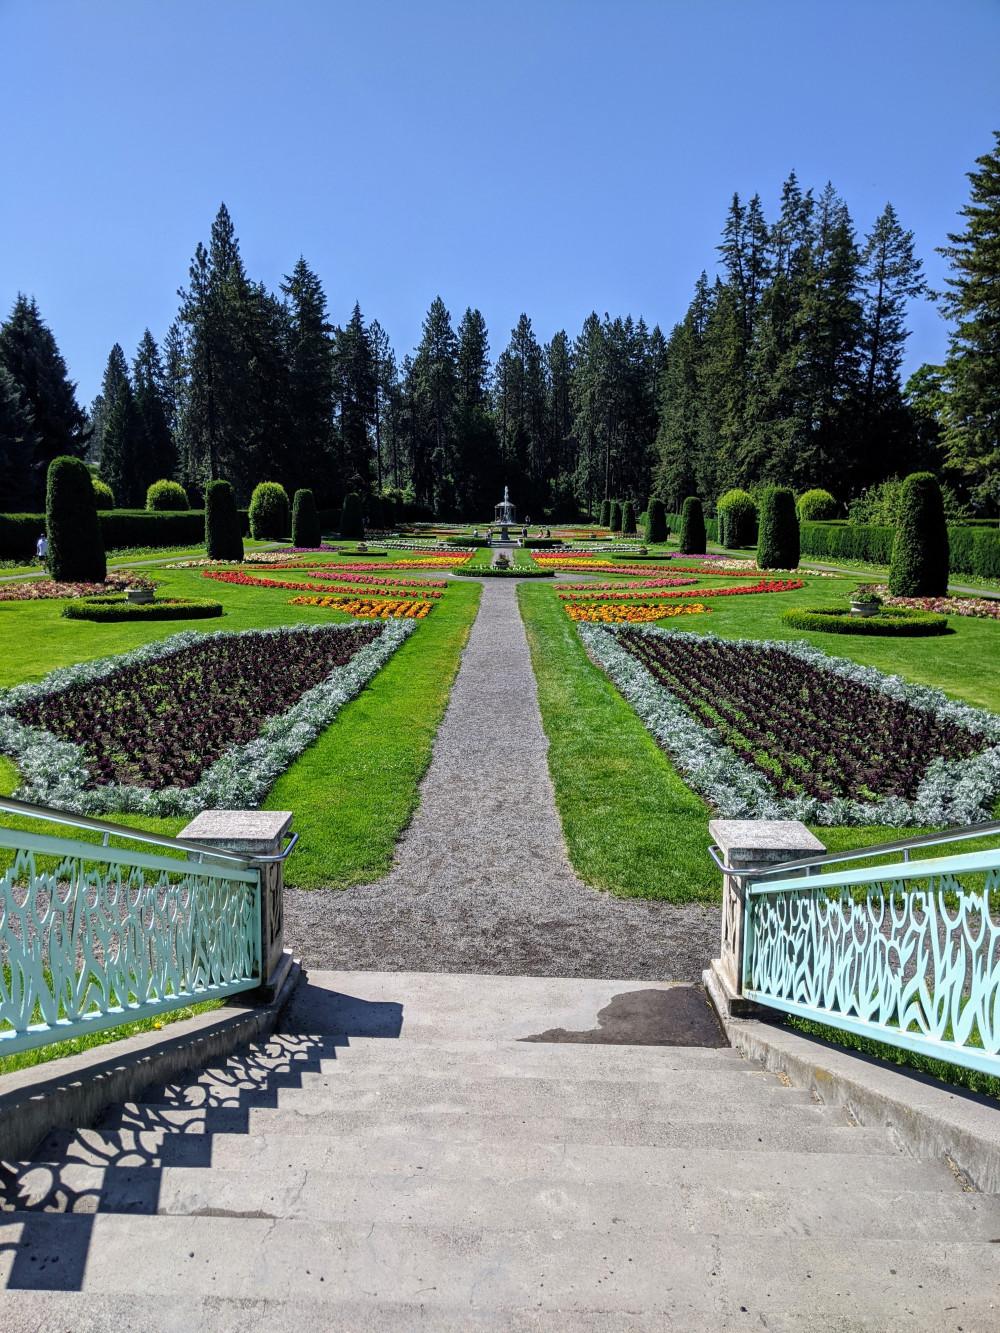 What Grows Best in Eastern Washington